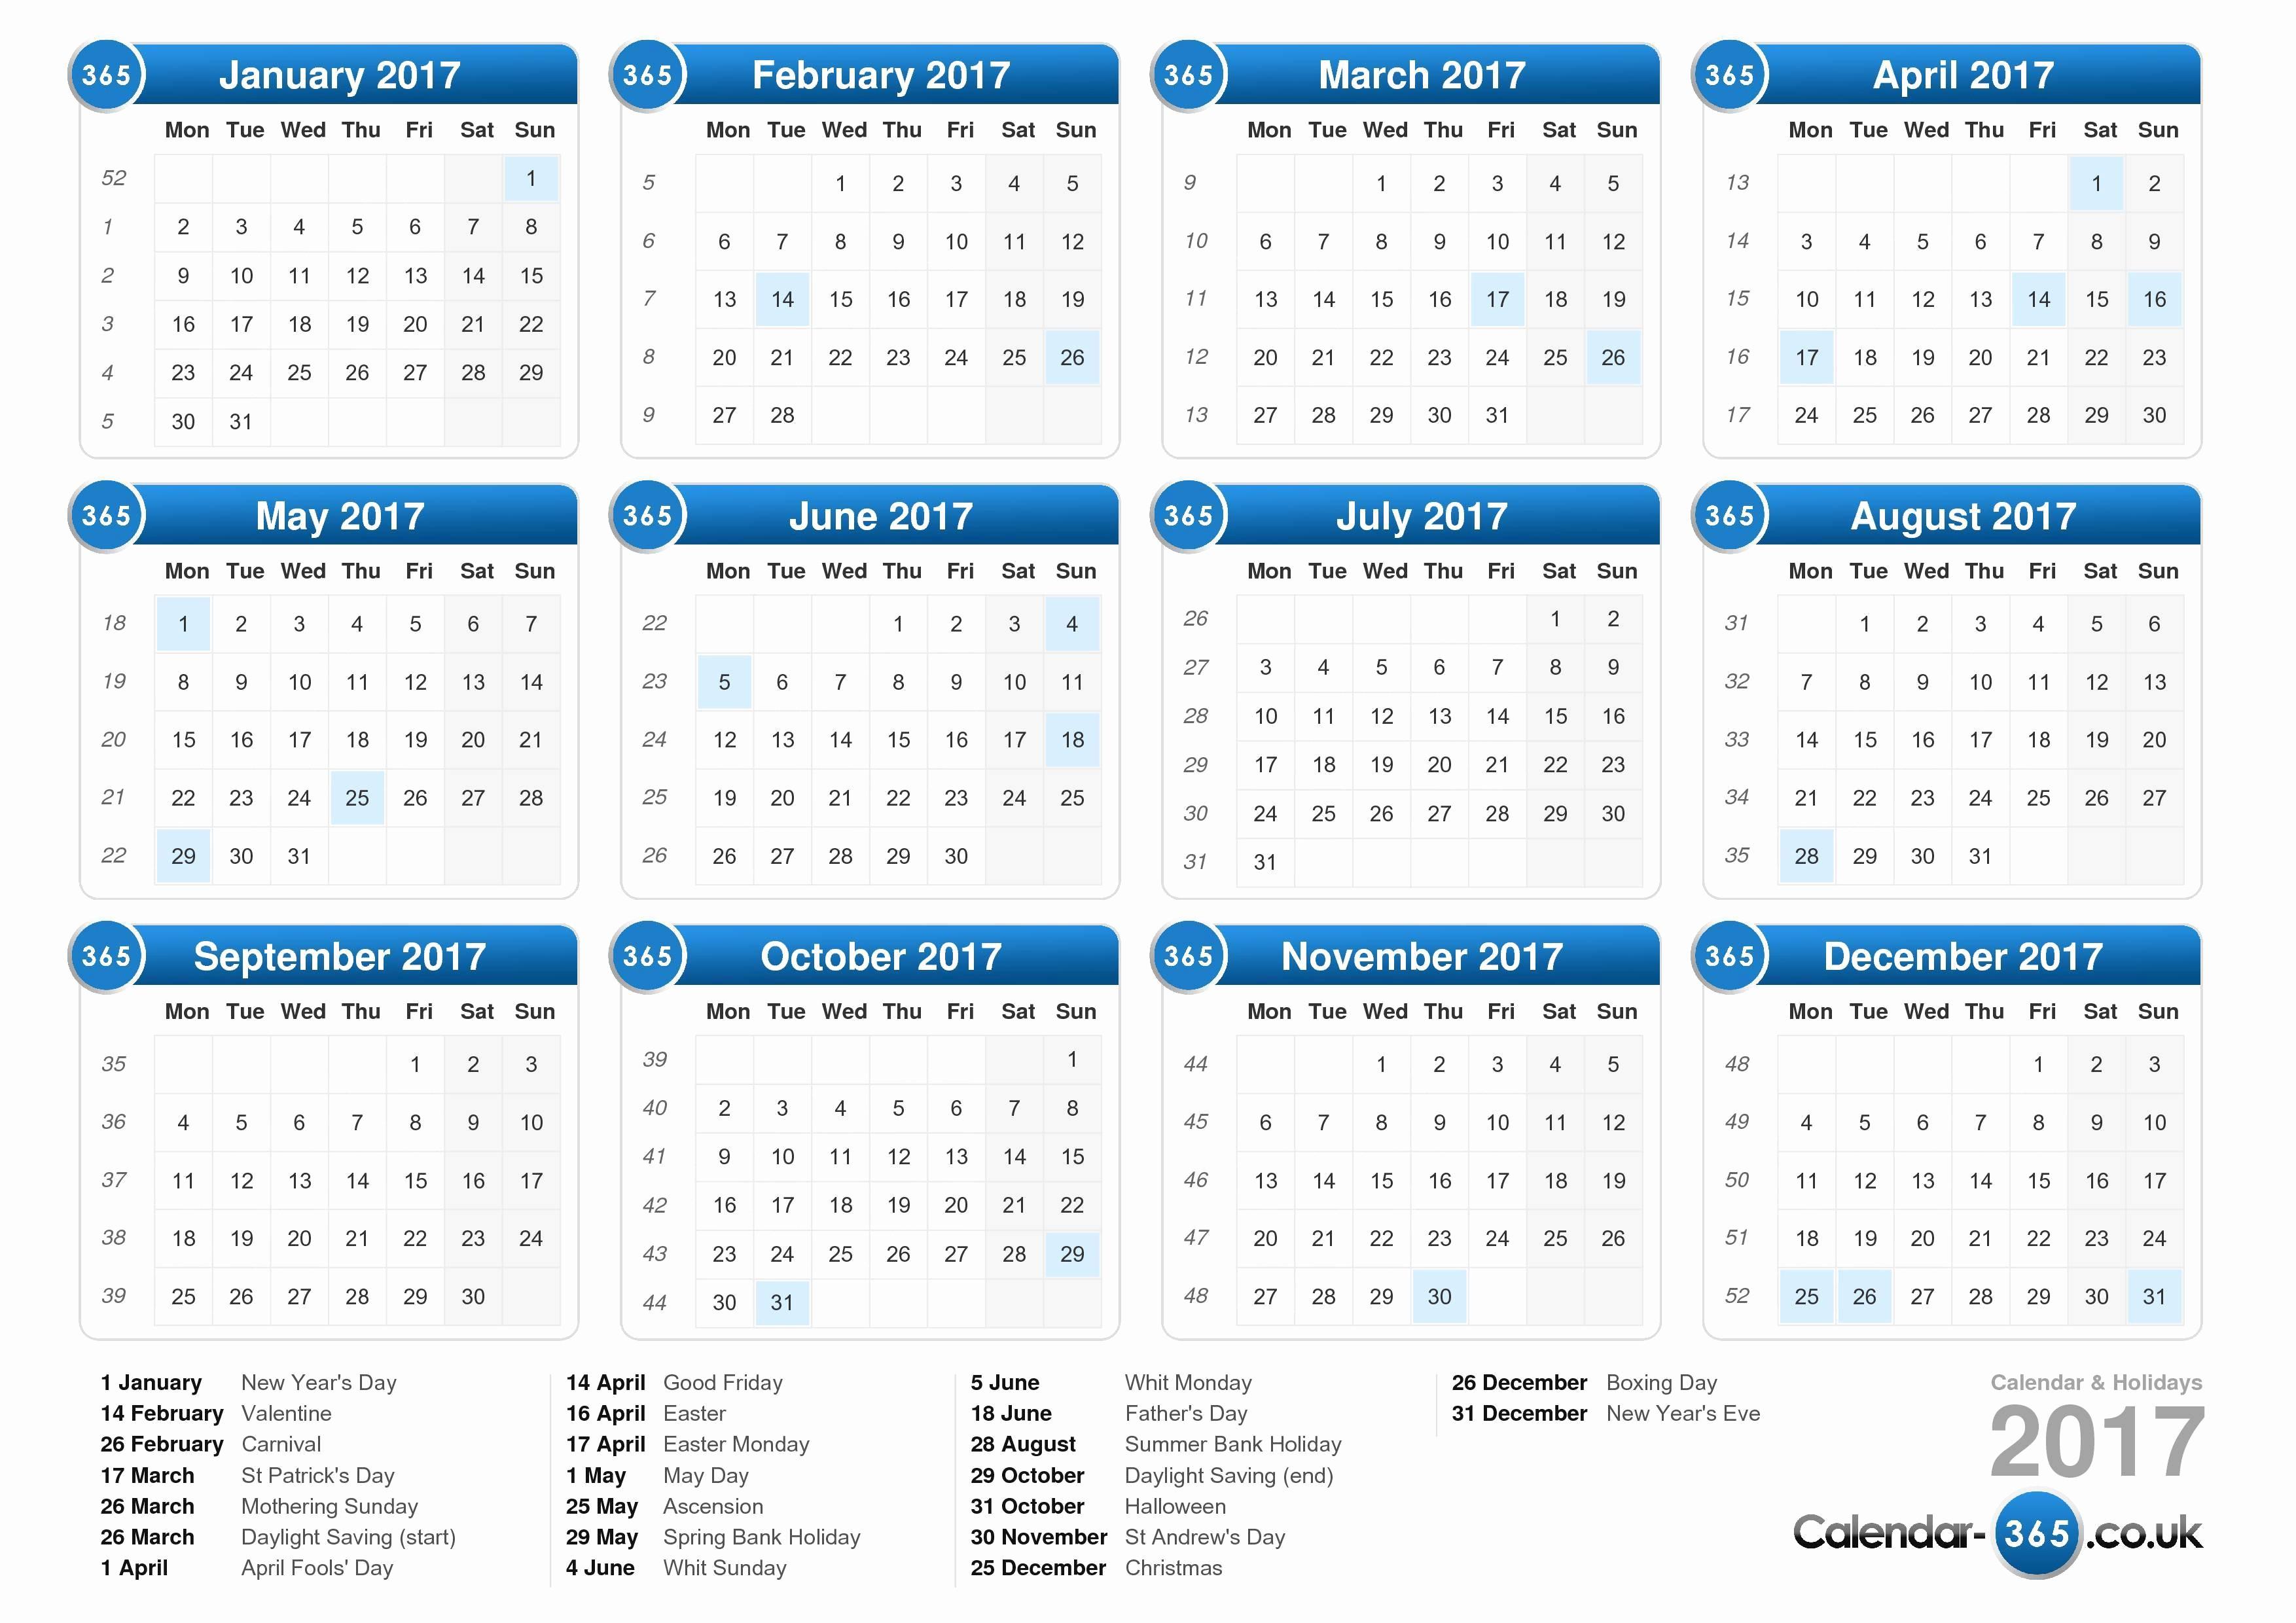 2017 Full Year Calendar Template Unique 2017 Calendar Uk